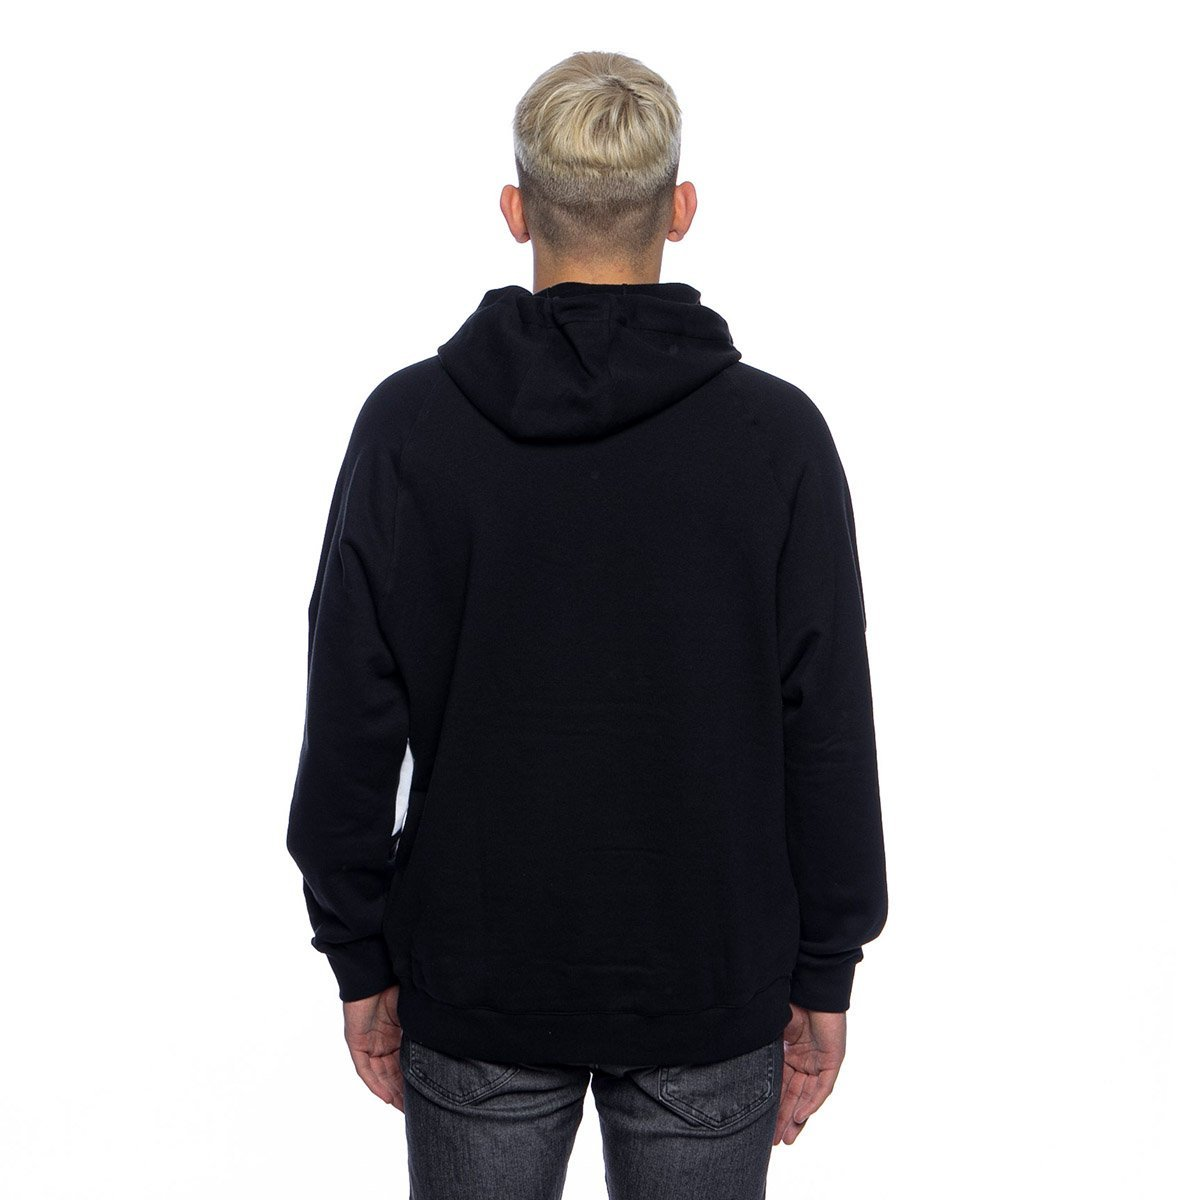 Adidas originals originals trefoil hoodie black white + FREE